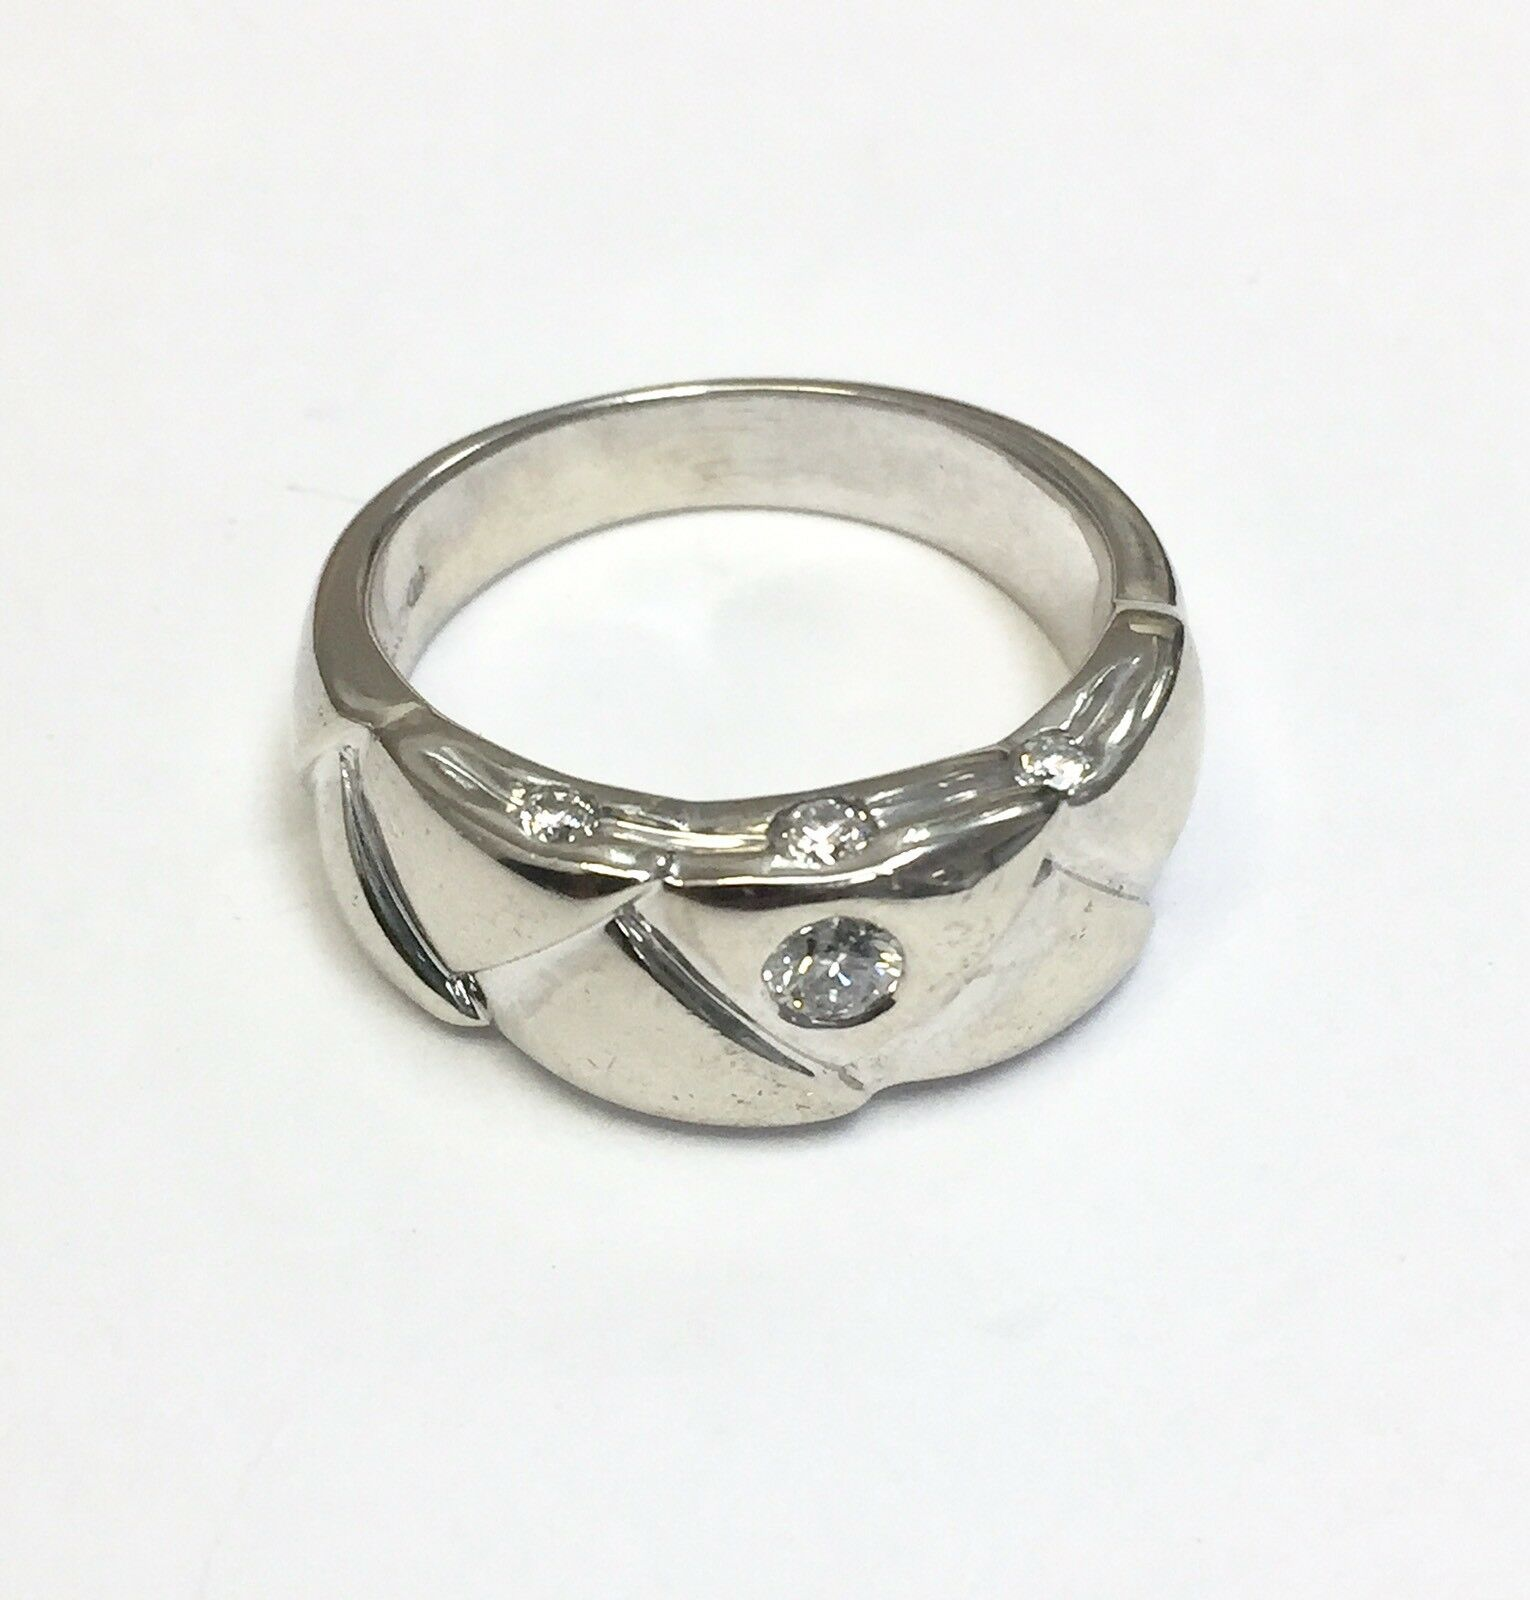 14k Solid Whita gold 1 2 TCW.. Diamond Men's Ring Size 9.75 (10.2 grams )